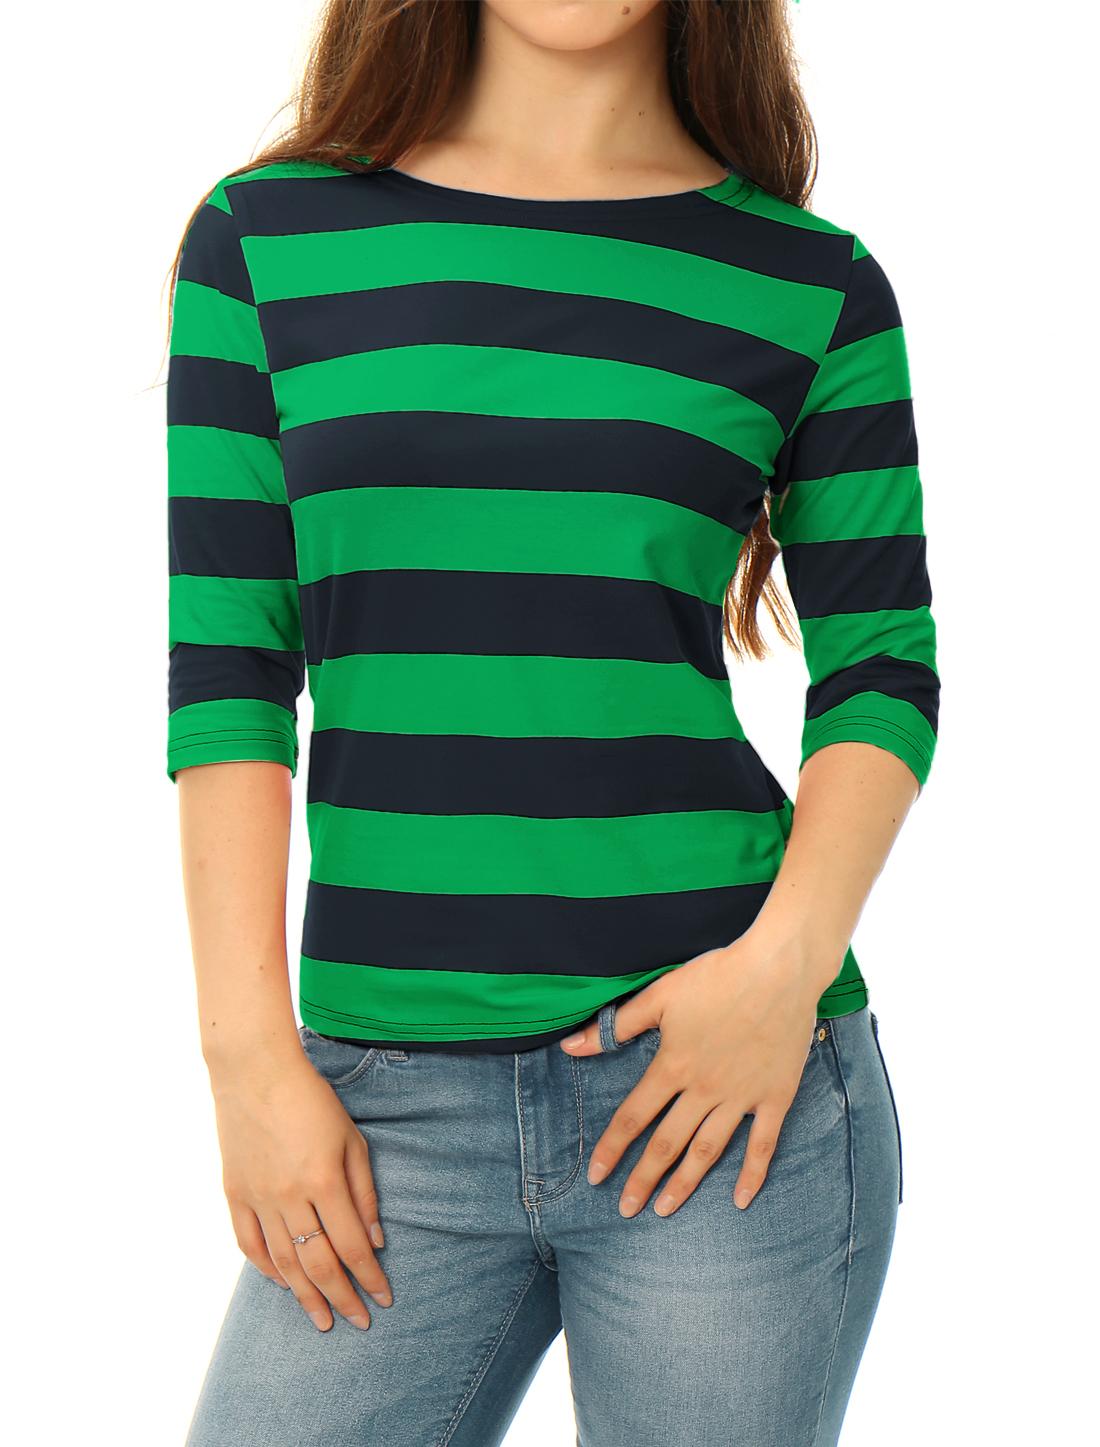 Women Half Sleeves Boat Neck Slim Fit Stripe Tee Dark Green XS